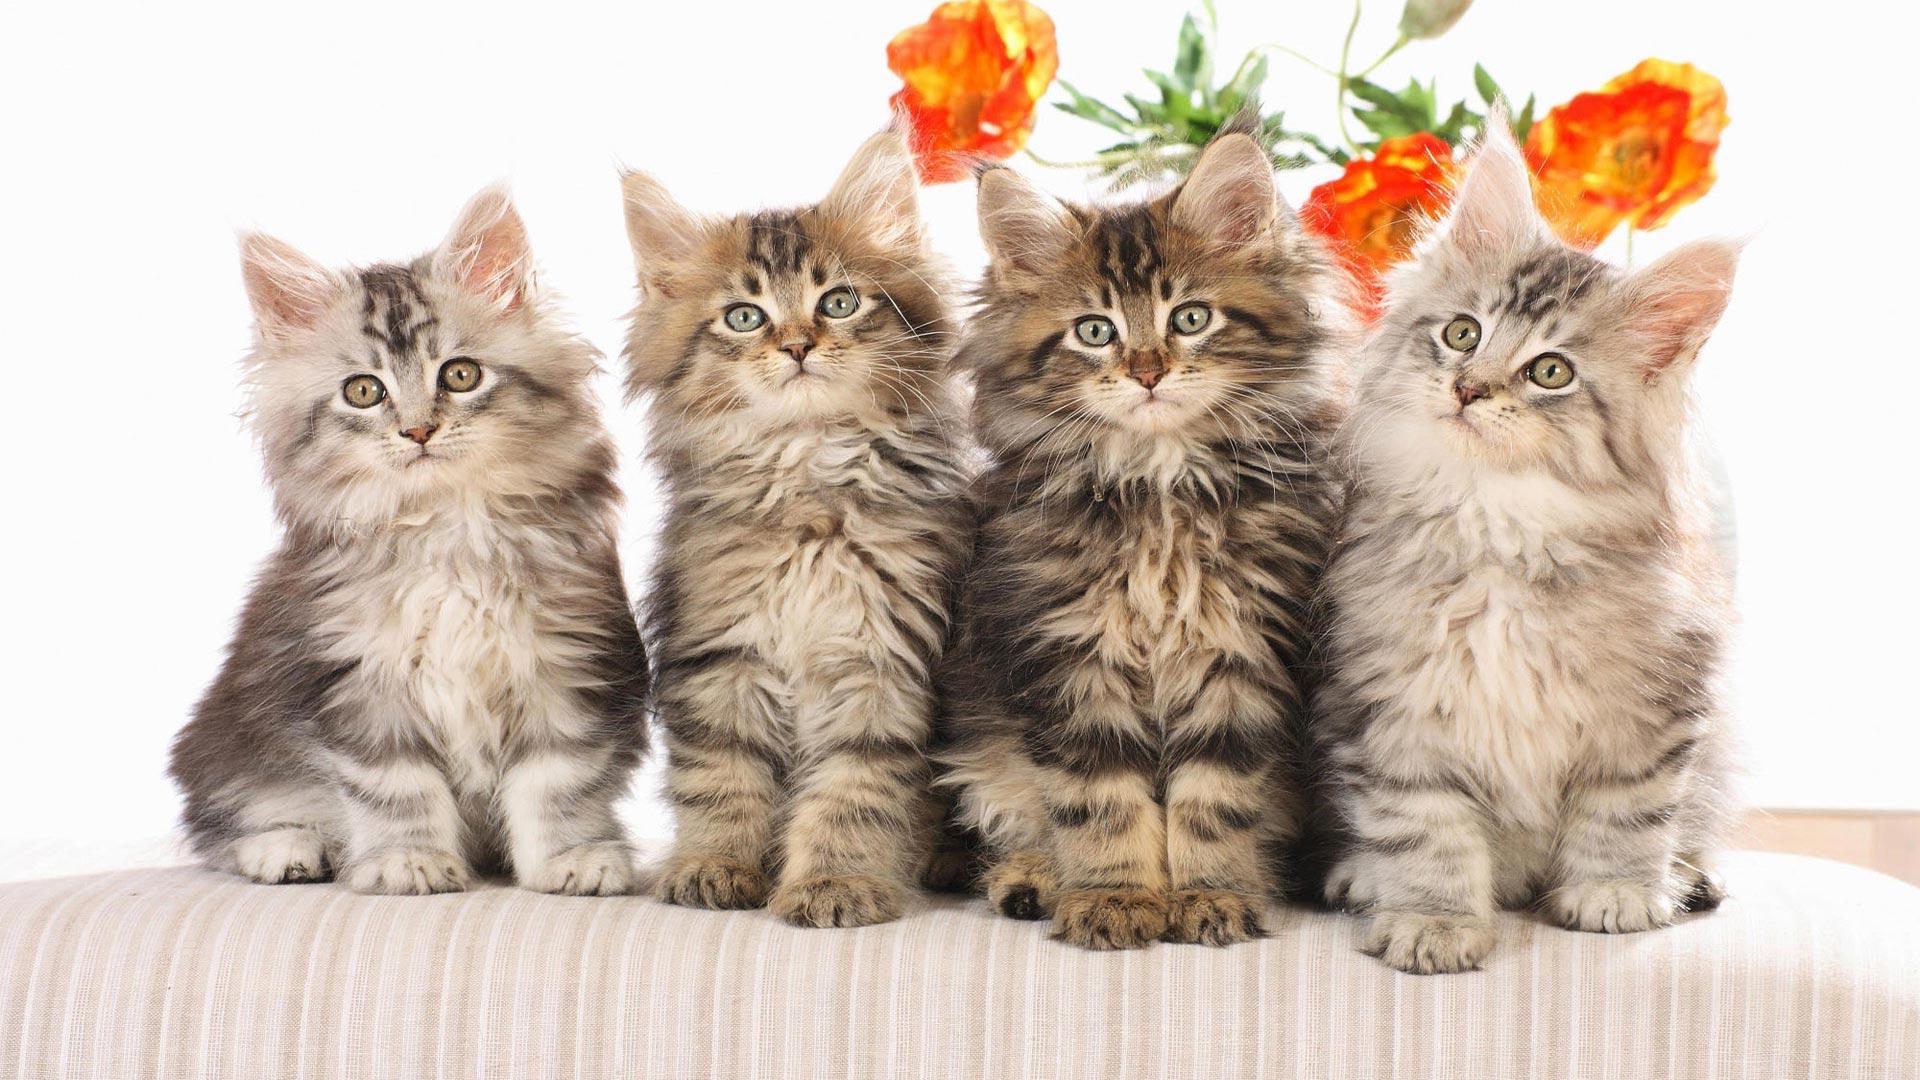 Широкоформатные обои Четыре пушистых ...: www.fullhdoboi.ru/photo/cats/chetyre_pushistykh_kotjat/29-0-24105